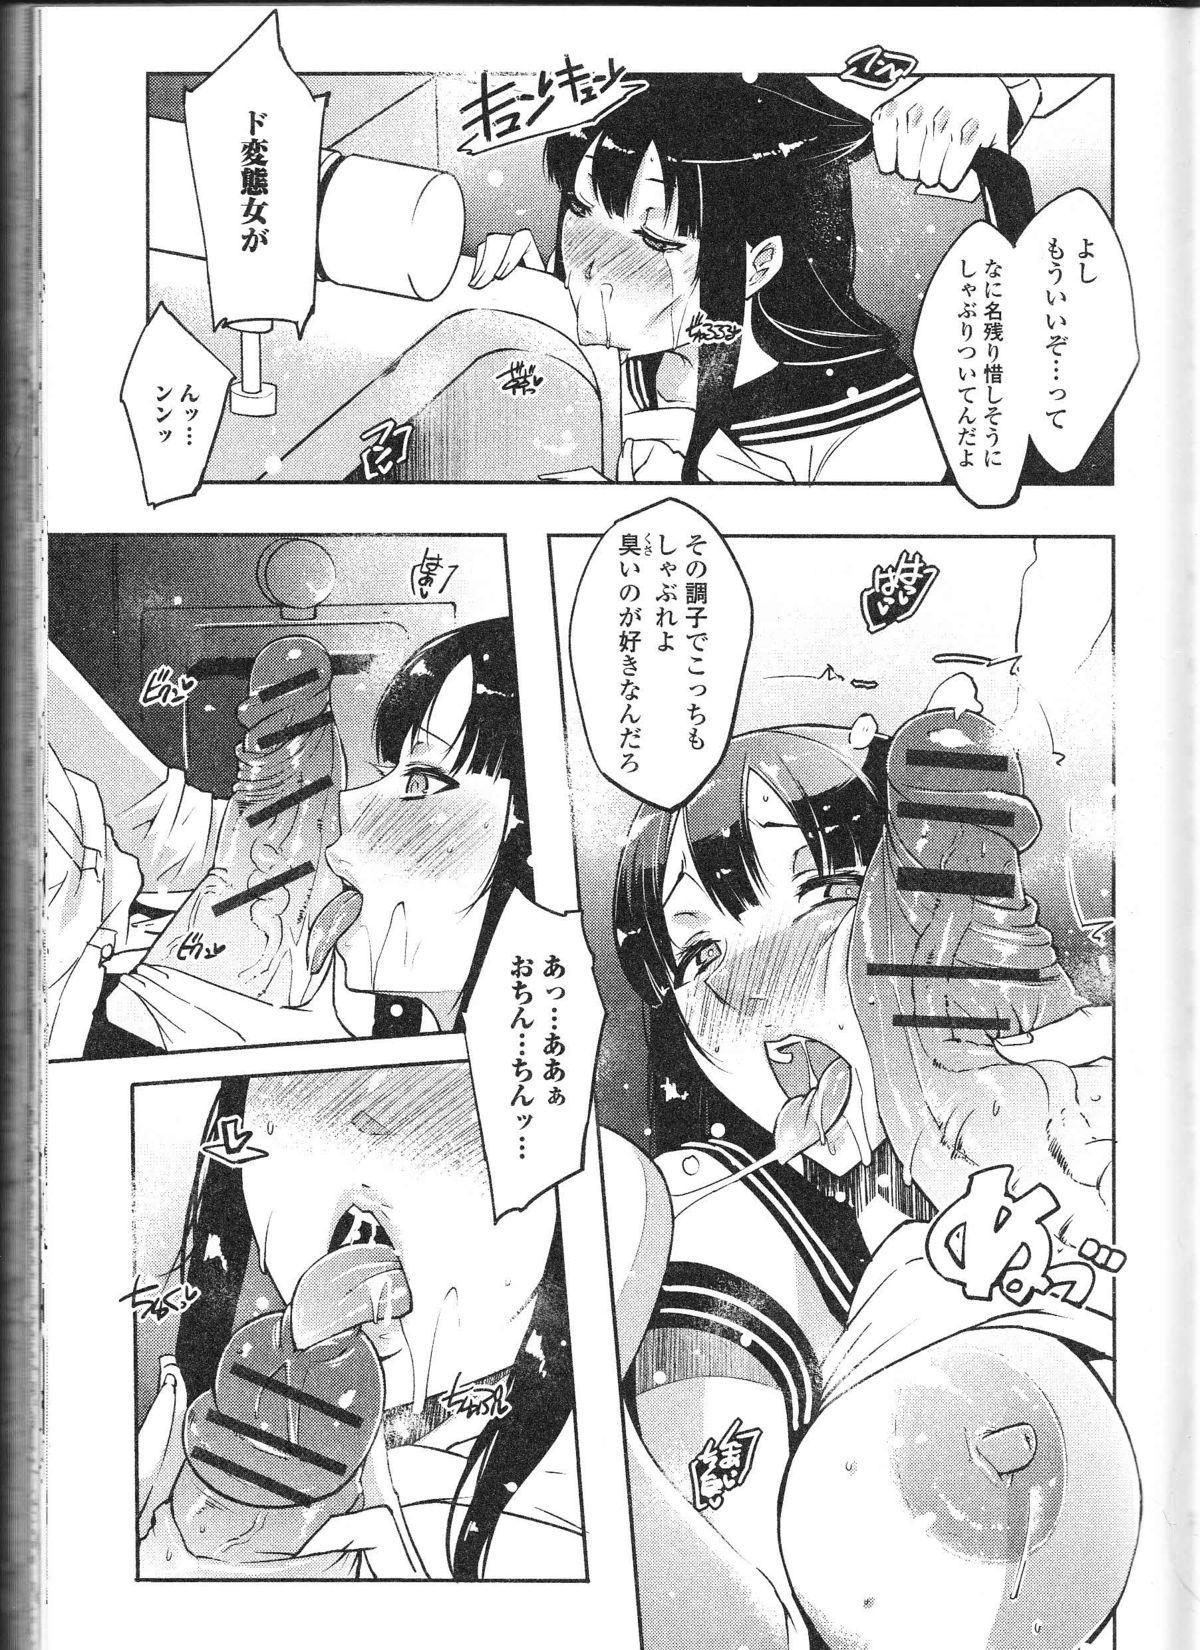 Nozoite wa Ikenai 9 - Do Not Peep! 9 79